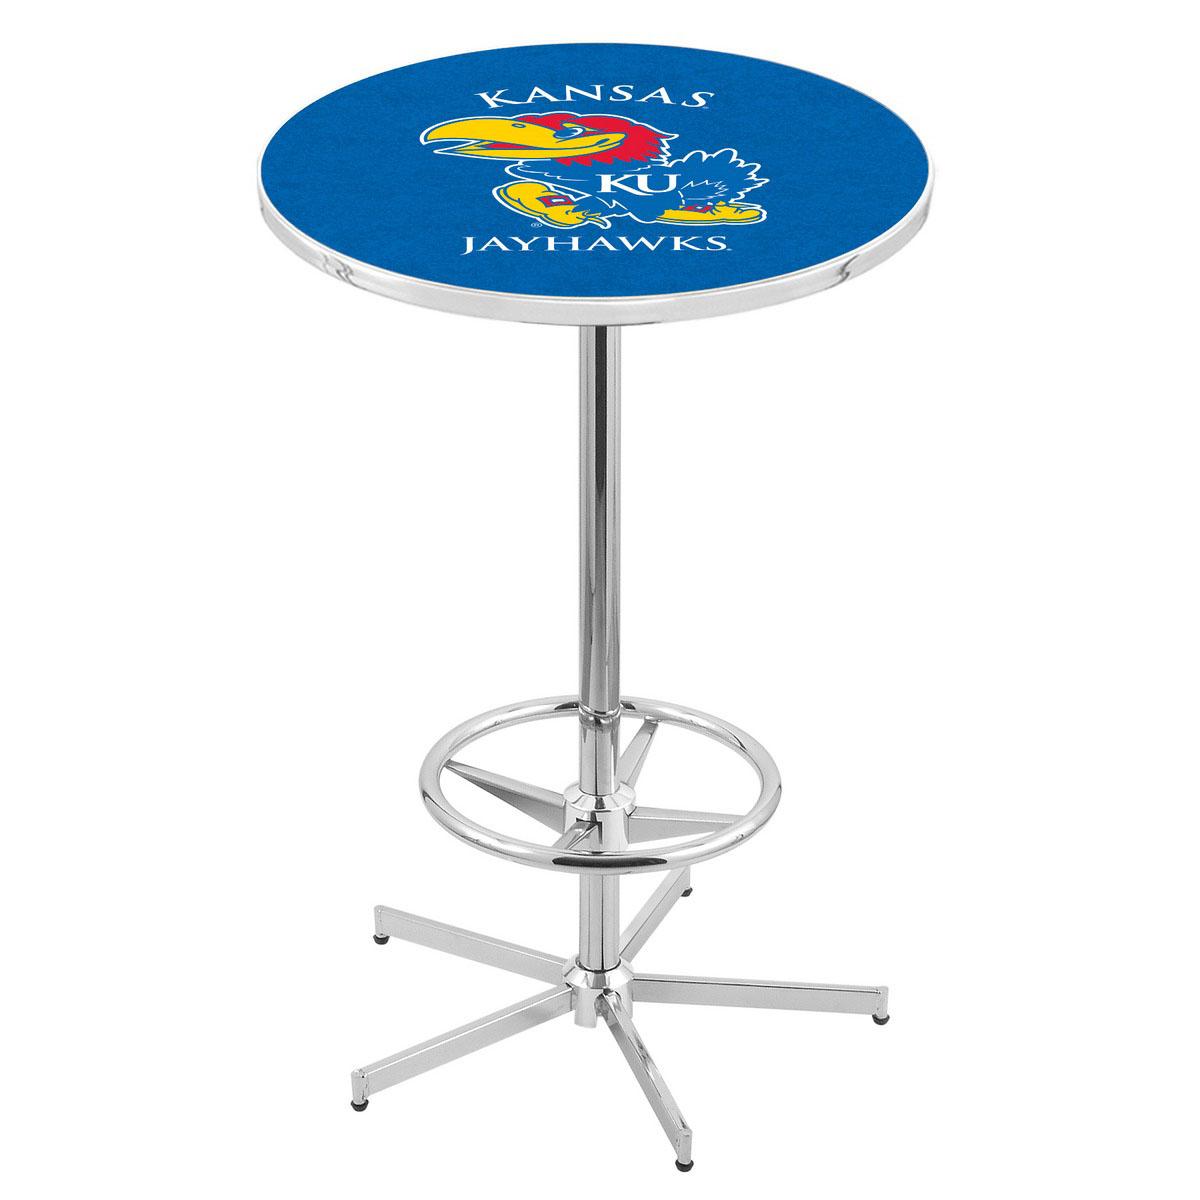 Lovable Chrome Kansas Pub Table Product Photo